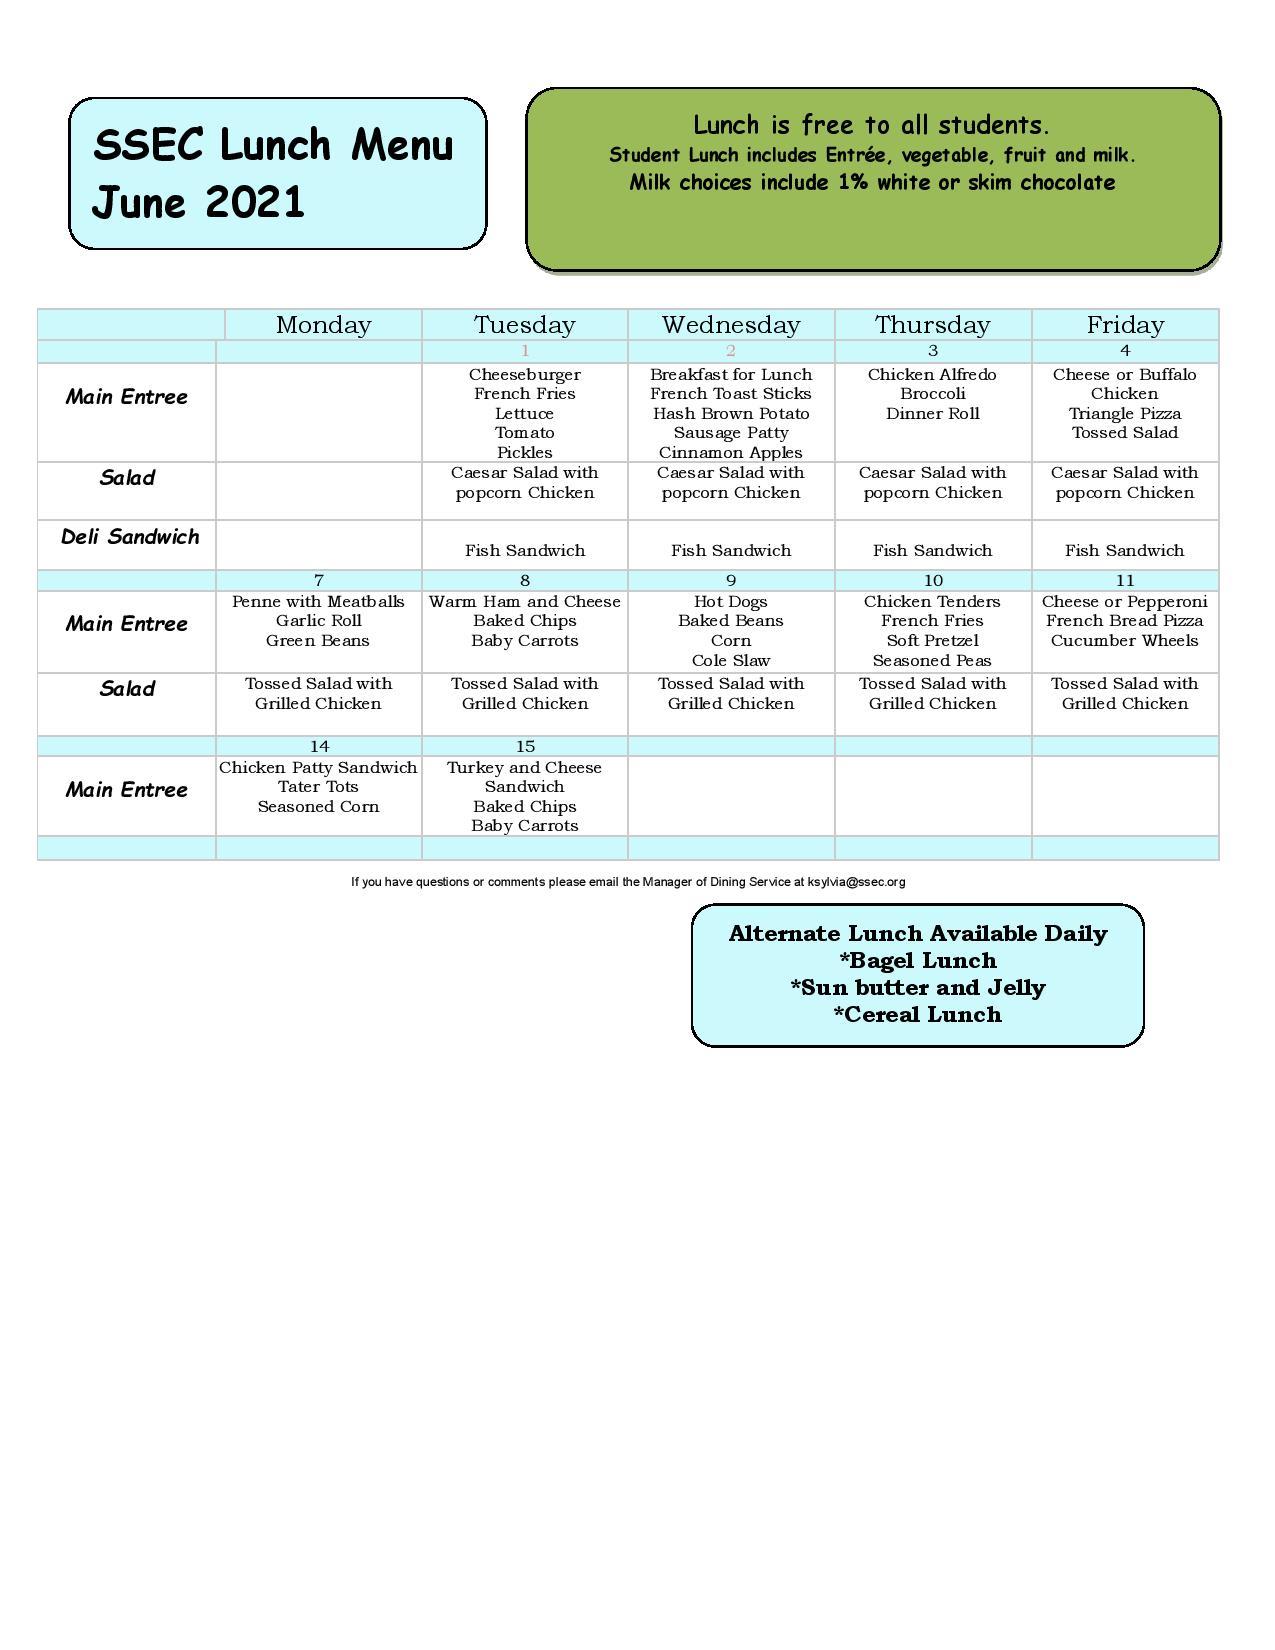 June 2021 Lunch menu